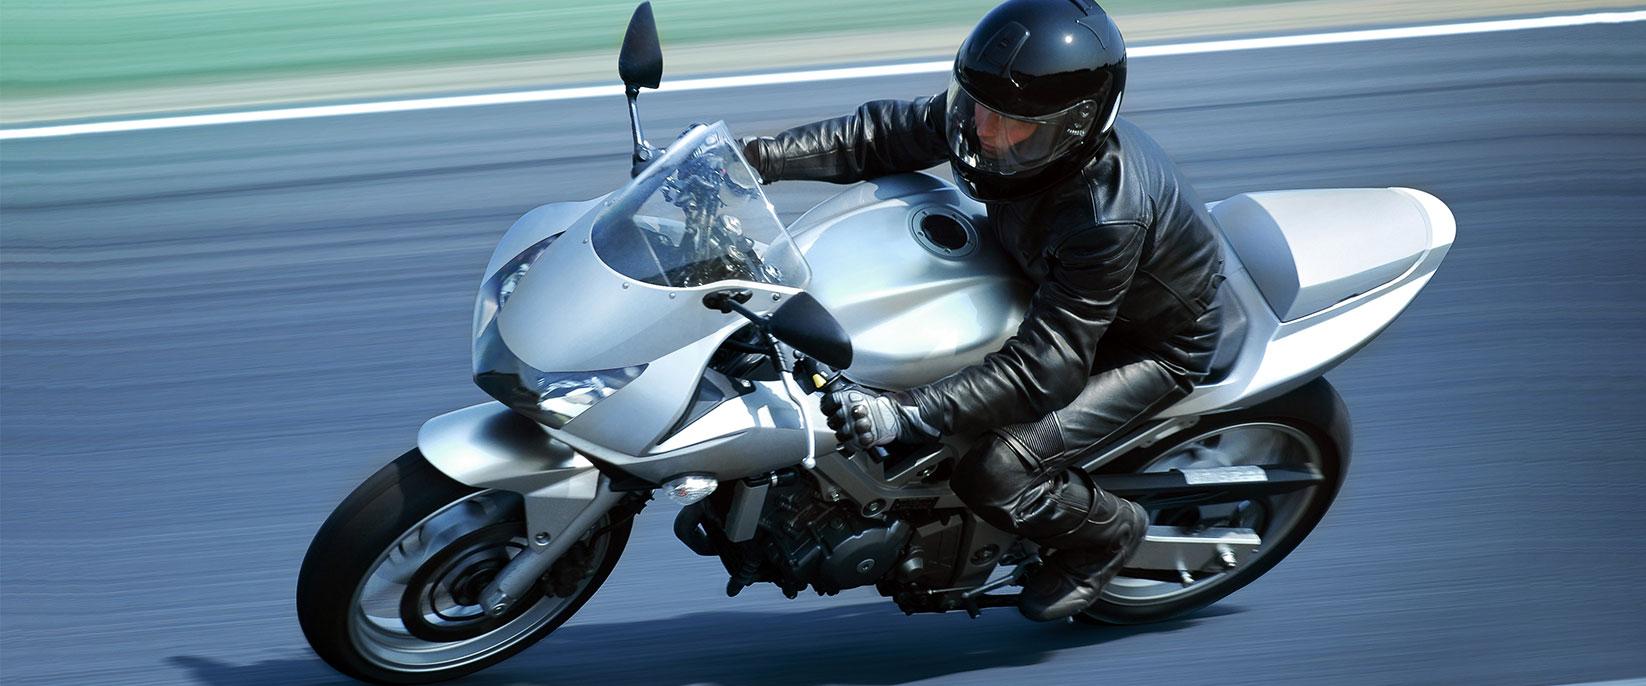 Motorräder fahren